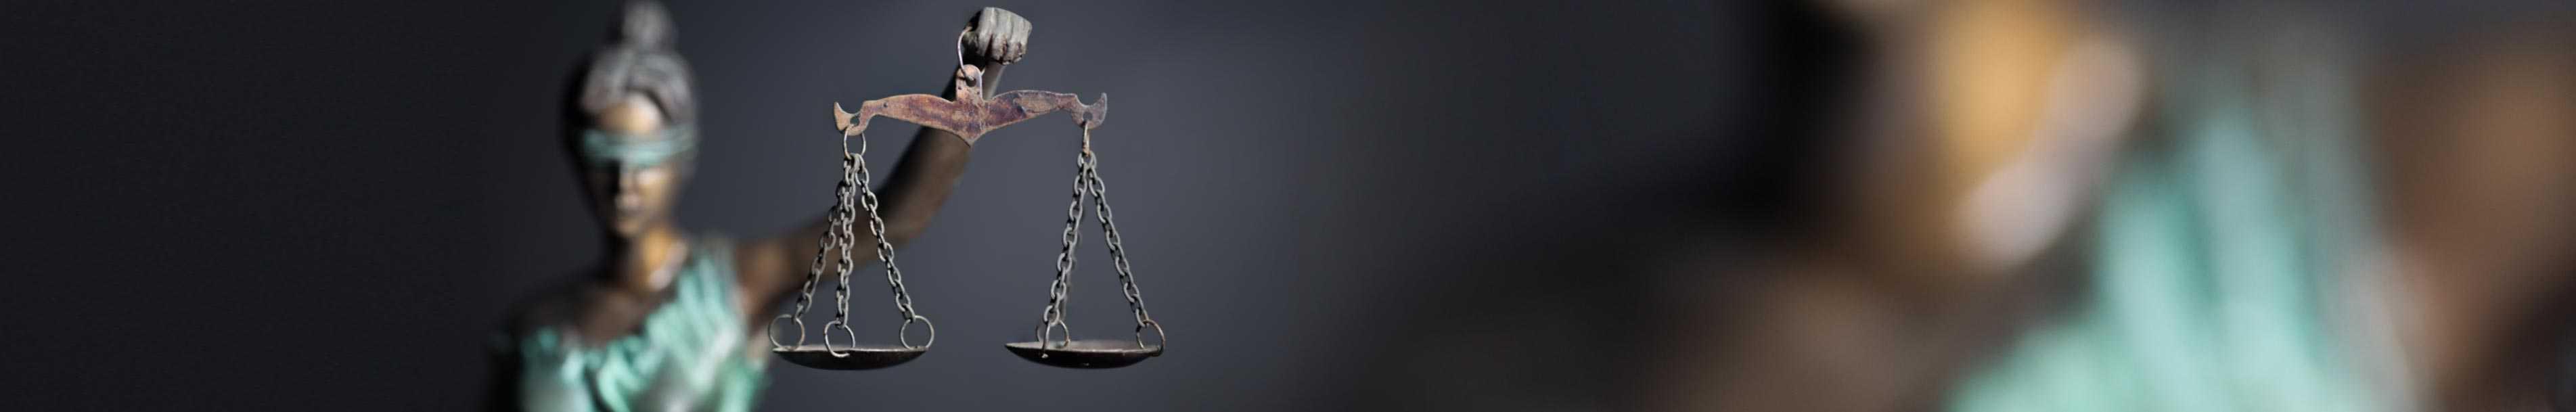 estudiar derecho online